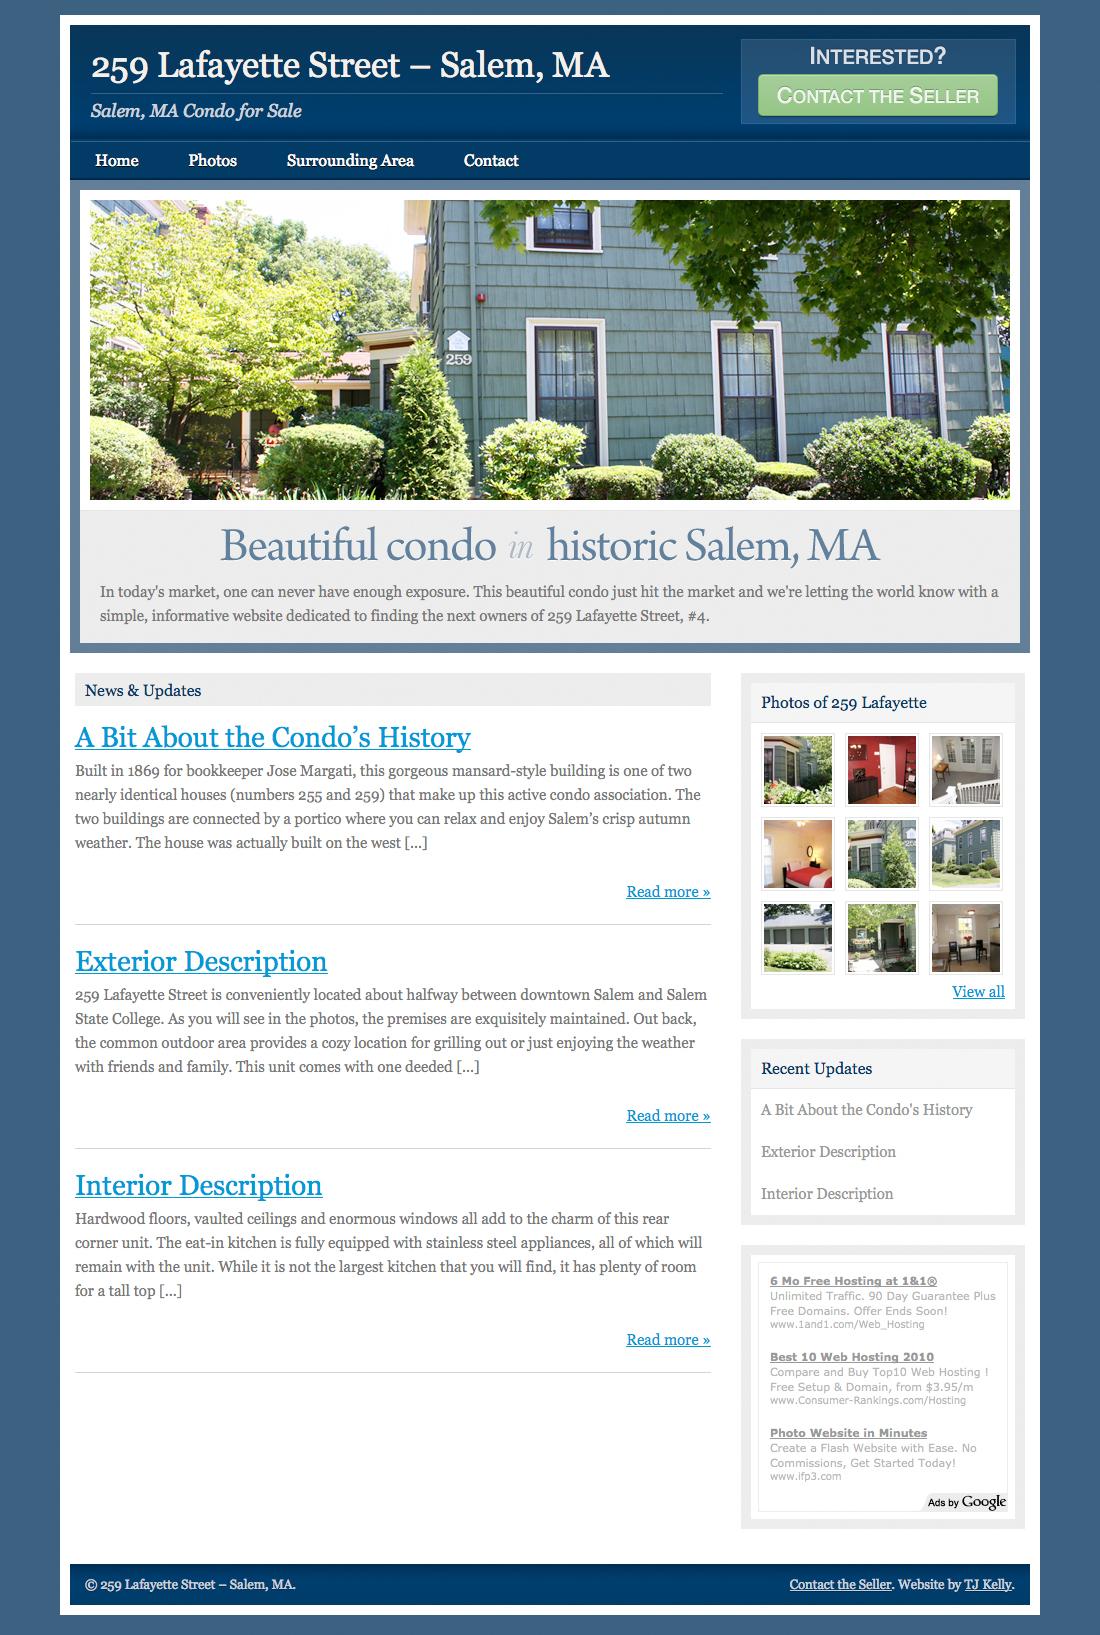 A screenshot of 259 Lafayette Street property website.